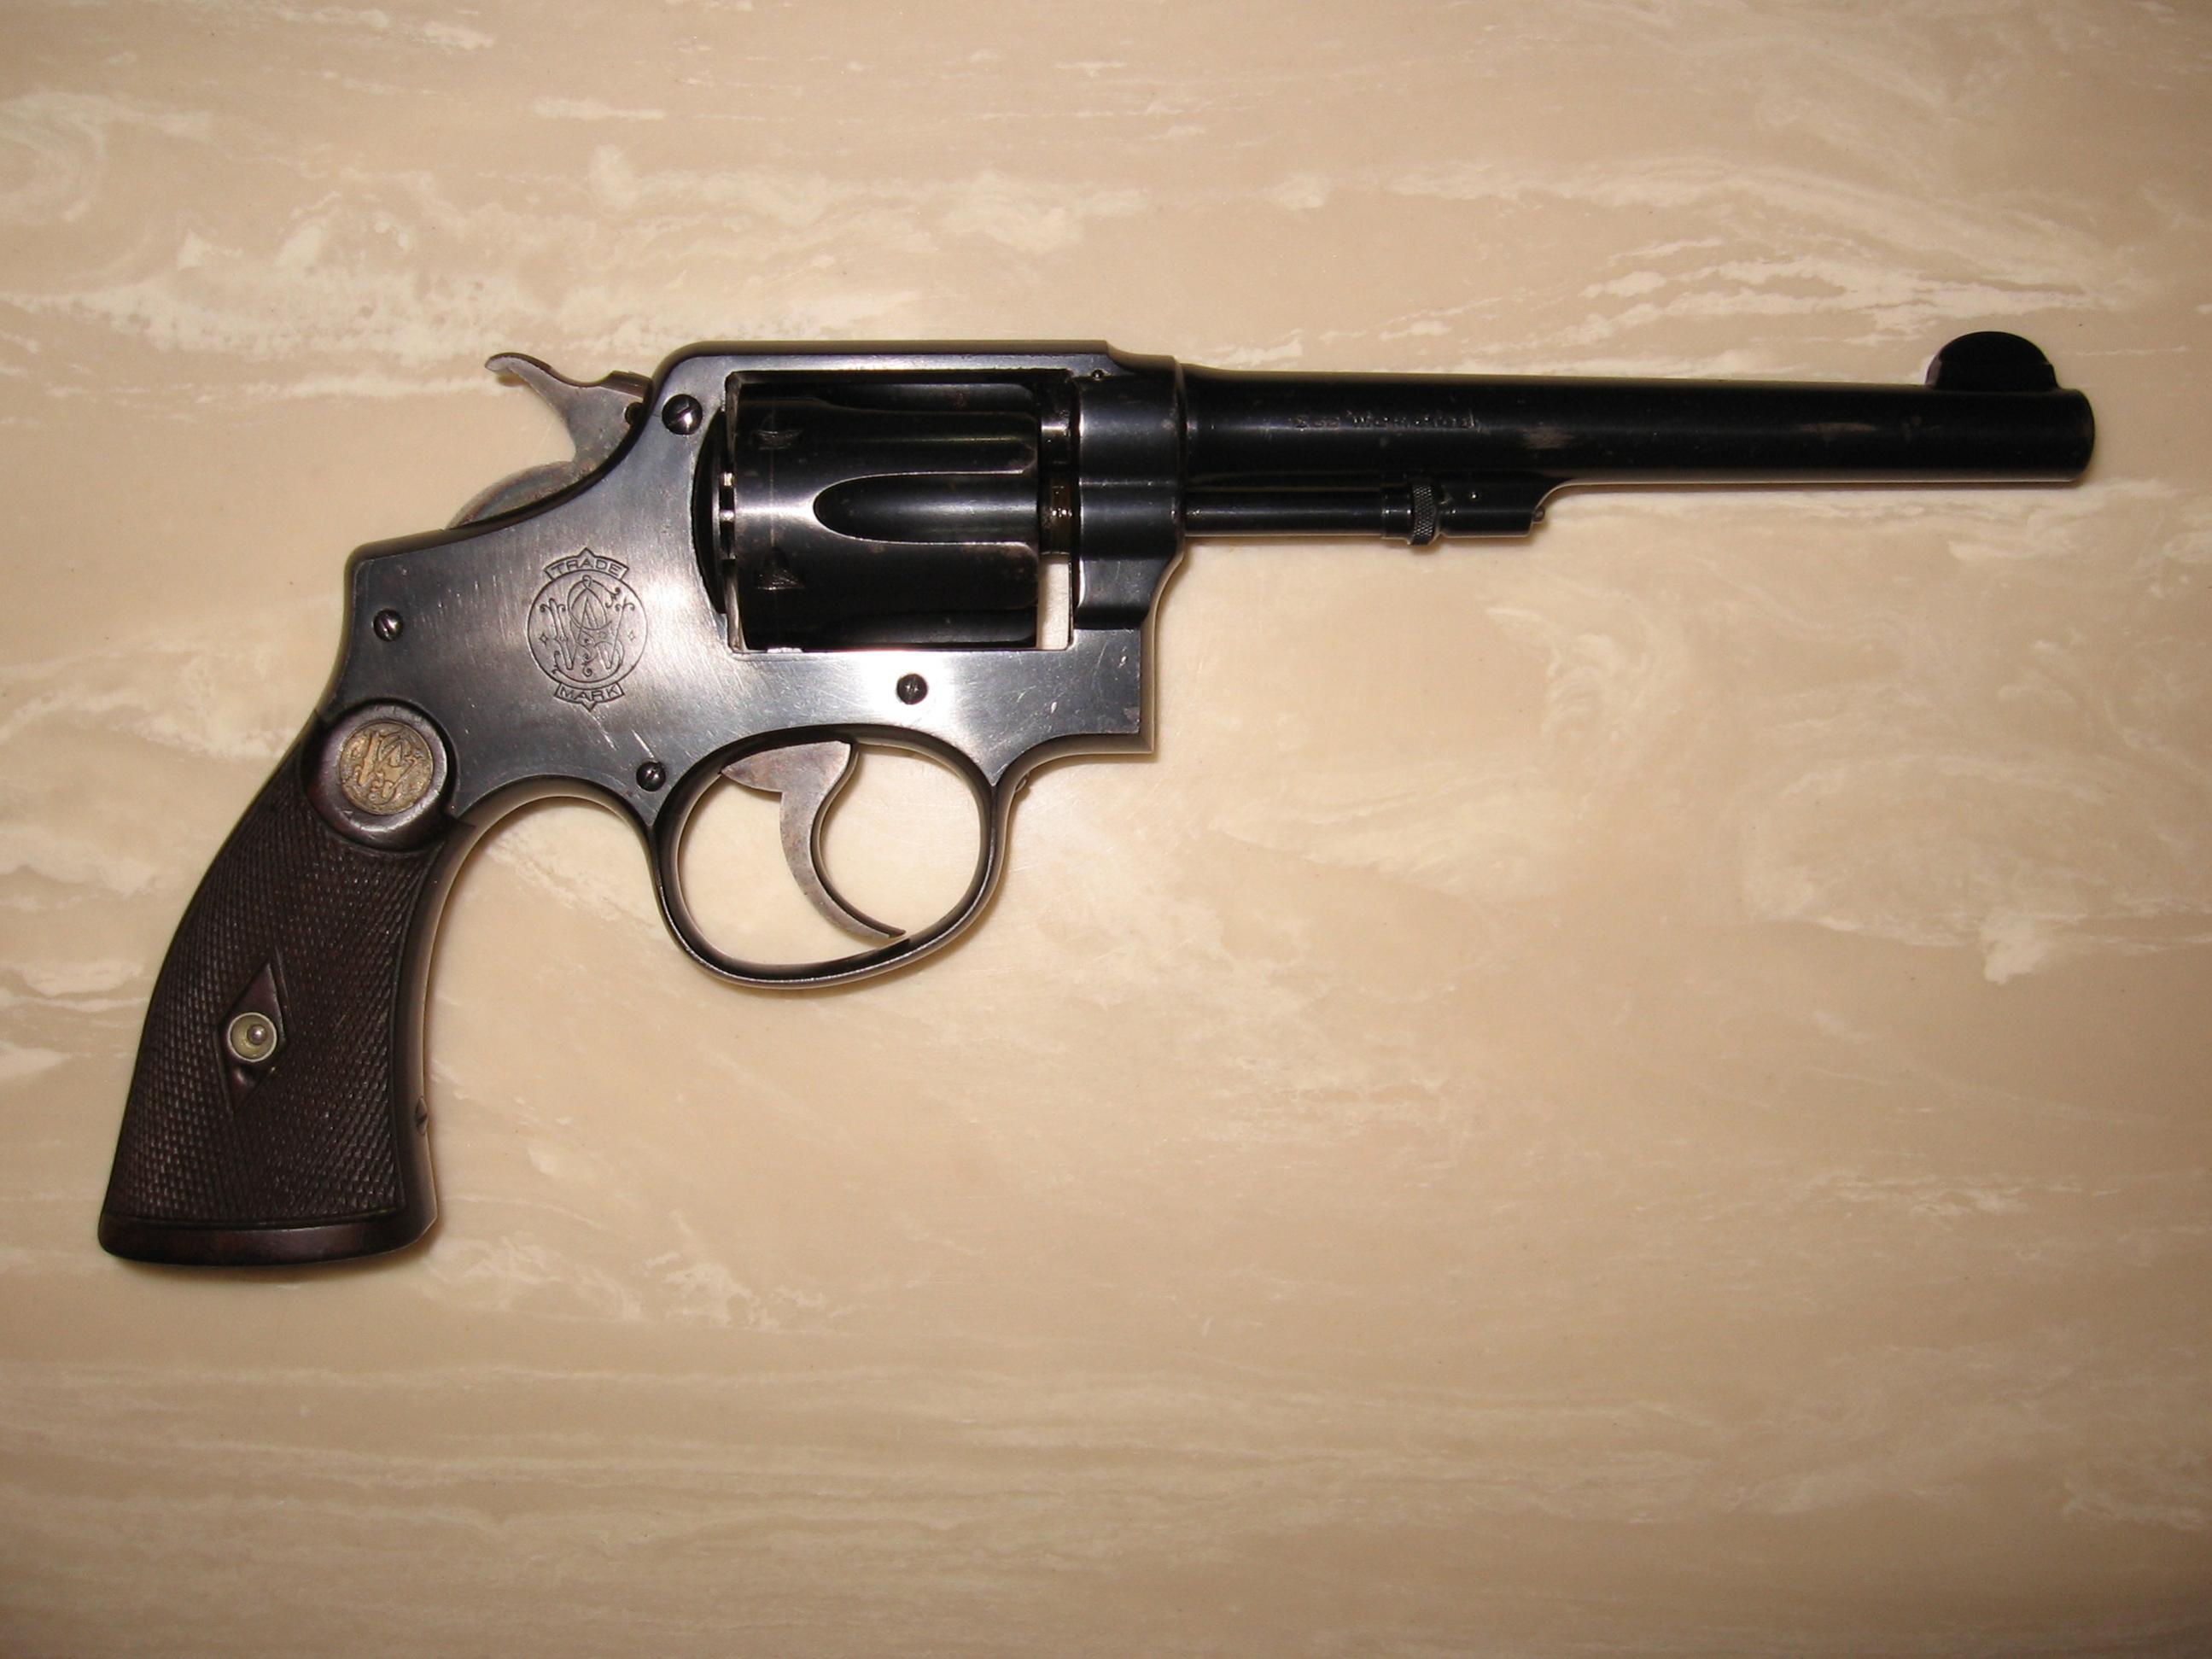 Please help identify these revolvers!-img_0637.jpg